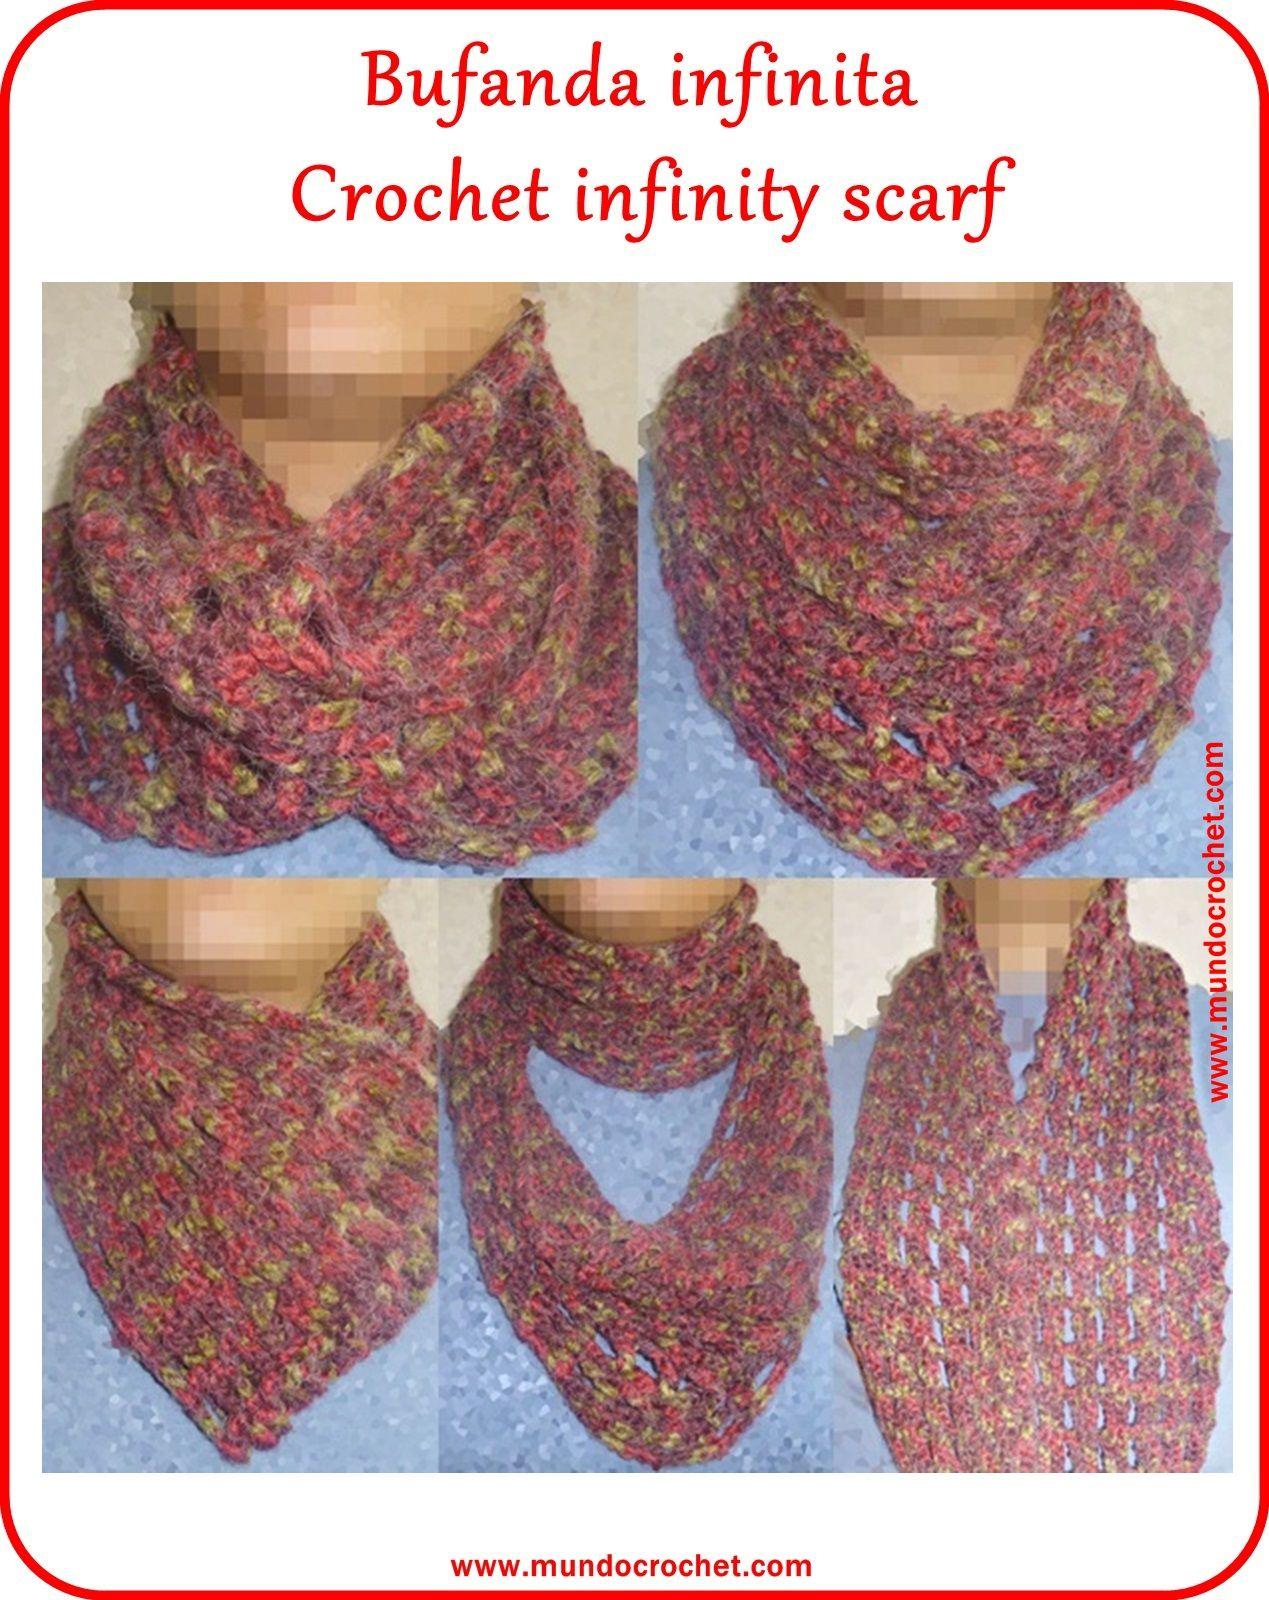 Bufanda infinita en crochet - Crochet infinity scarf | ШАЛИ, ШАРФЫ ...